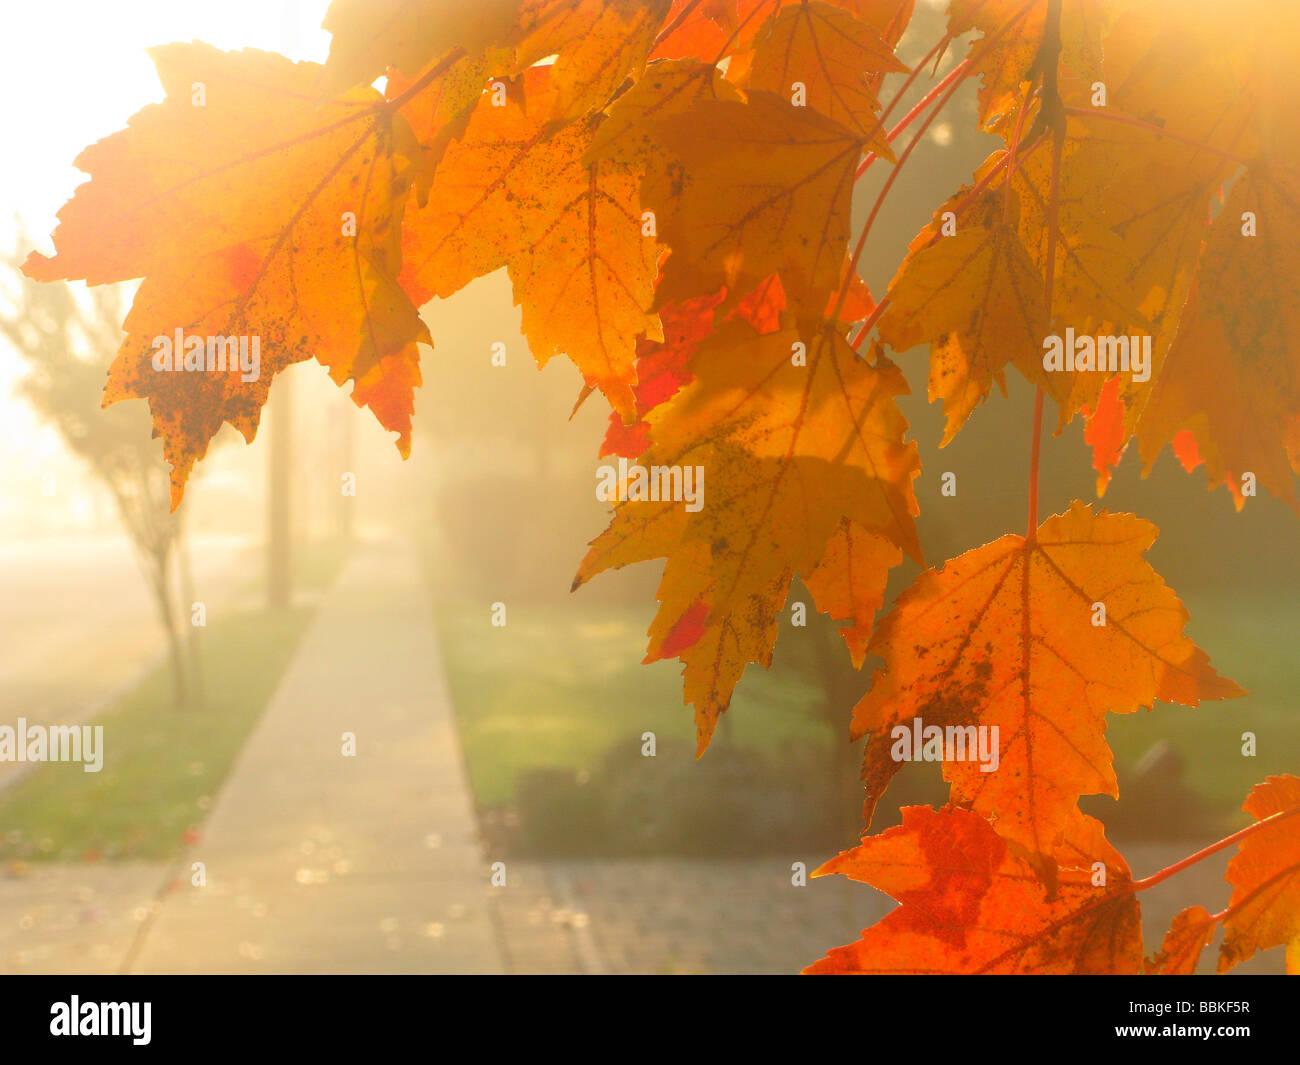 Jaune feuilles d'automne Photo Stock